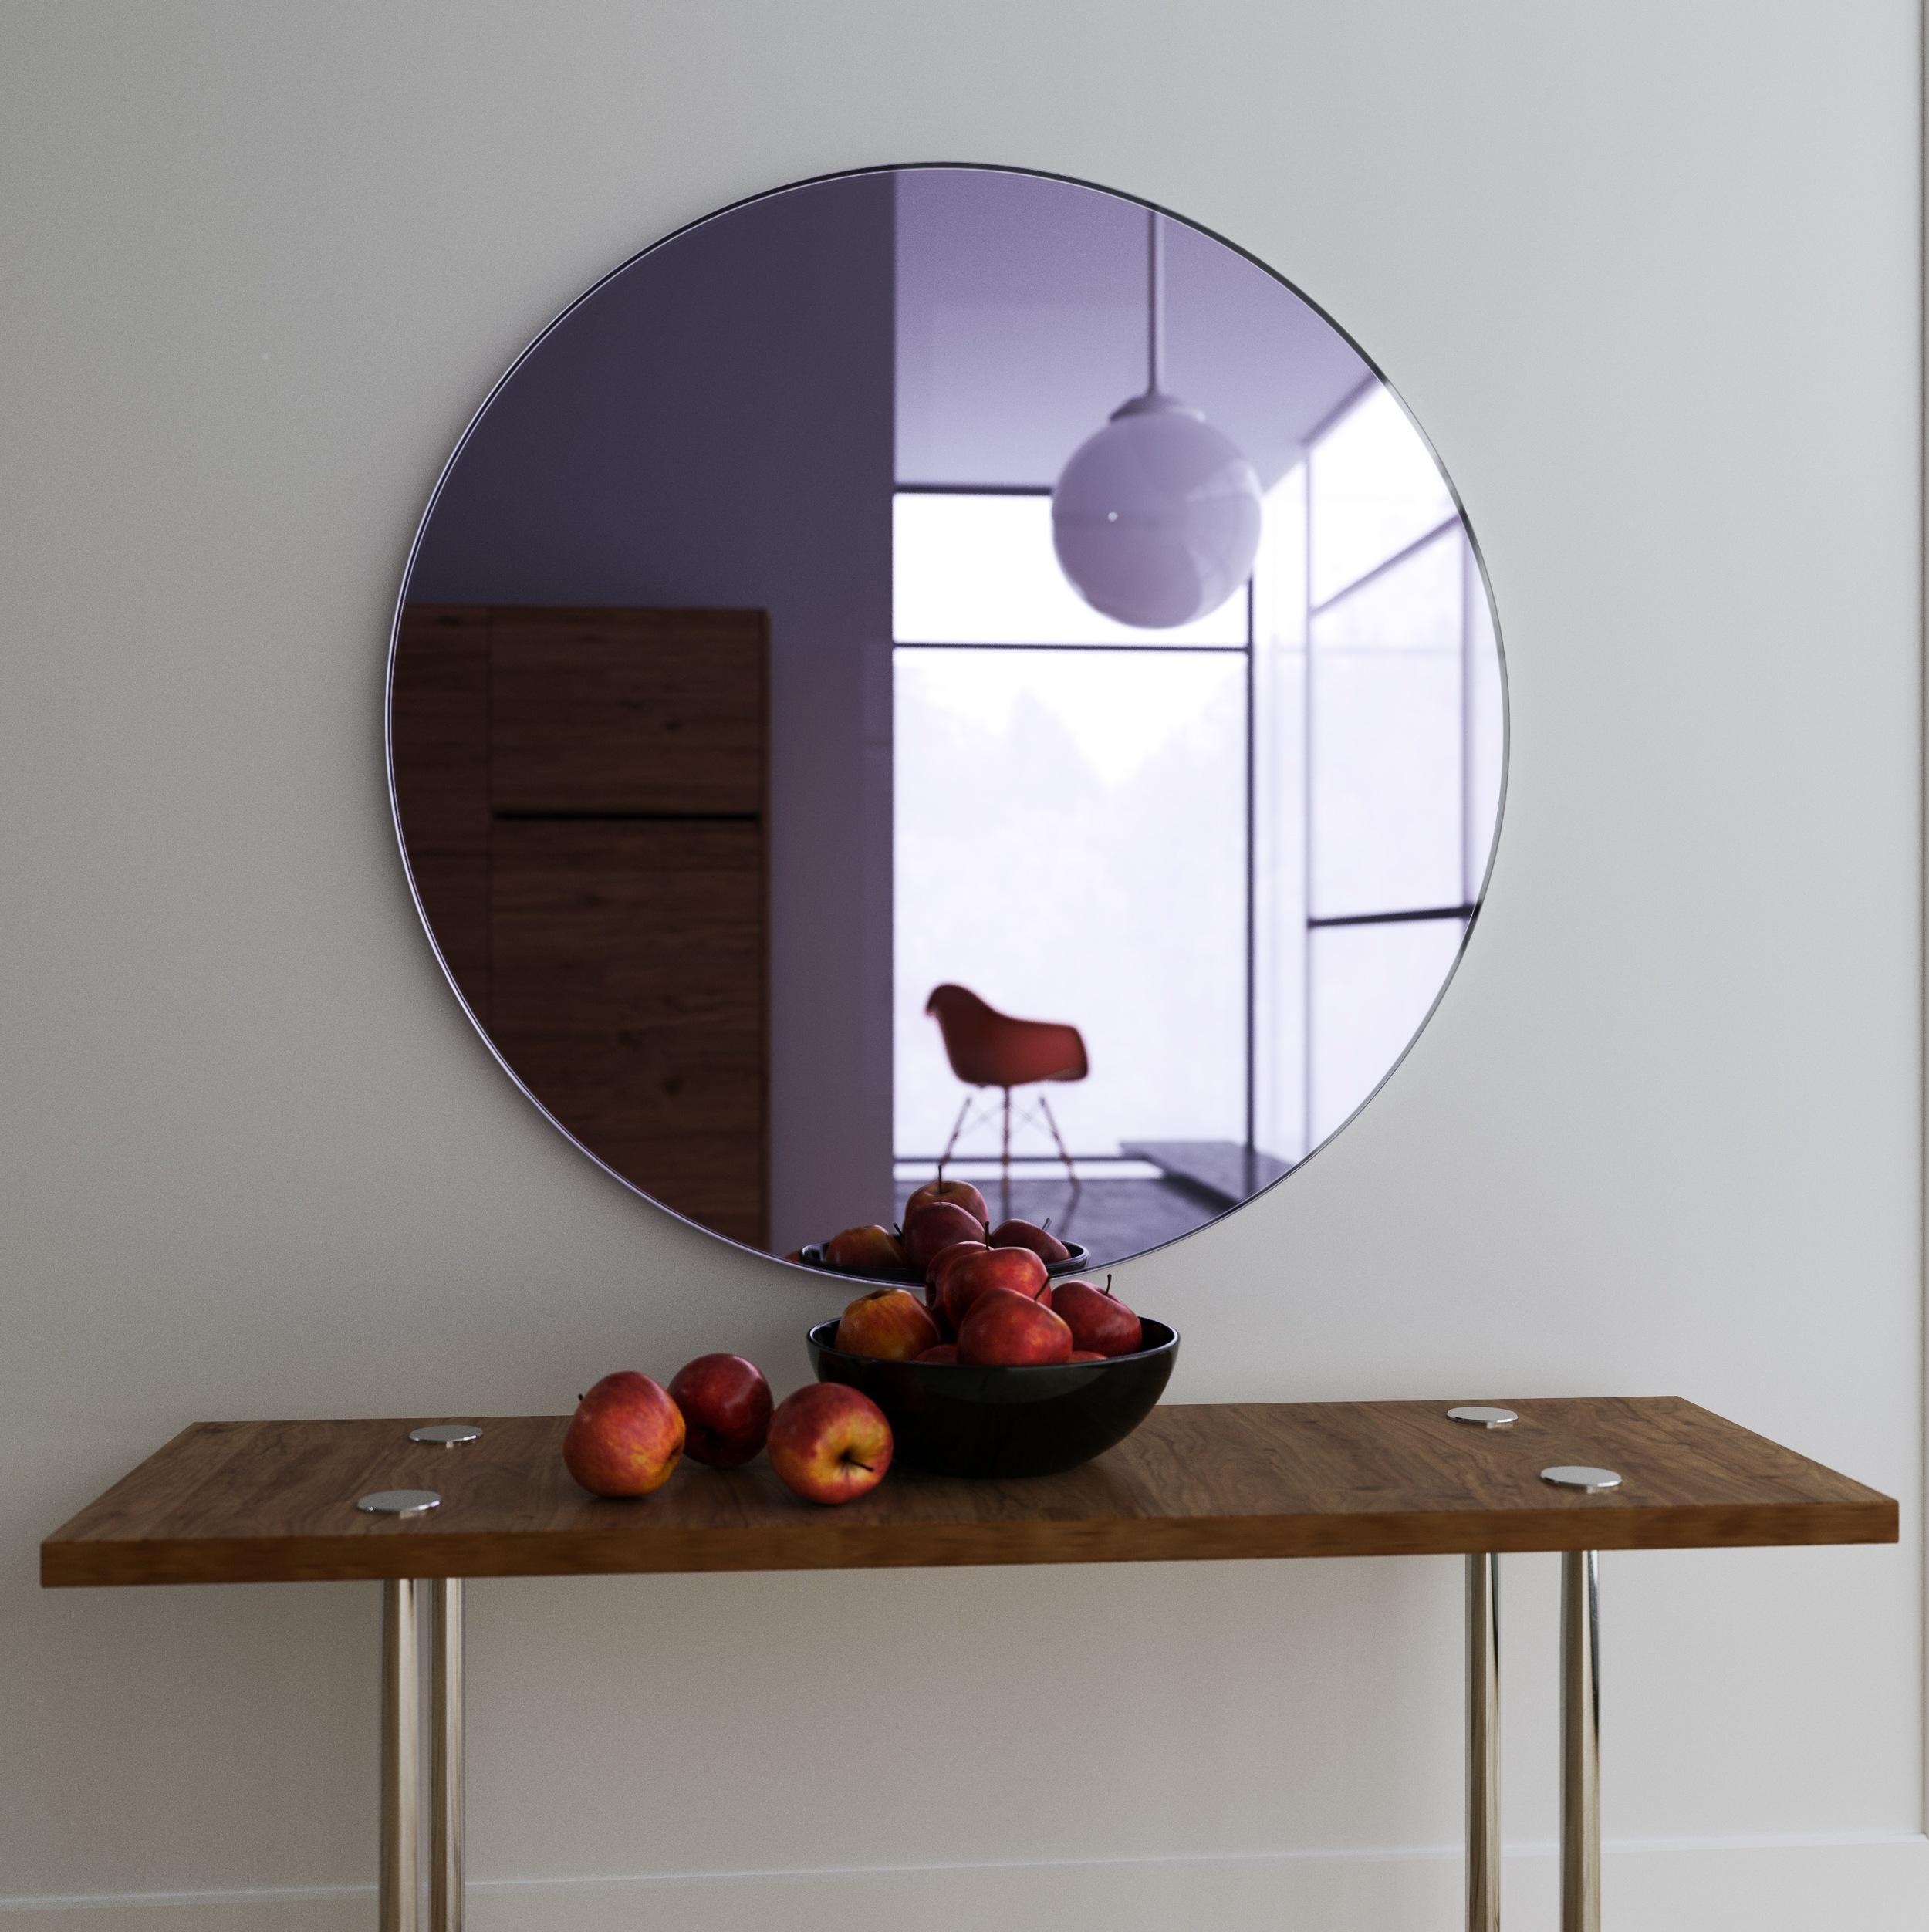 Hanging, frameless round purple wall mirror.